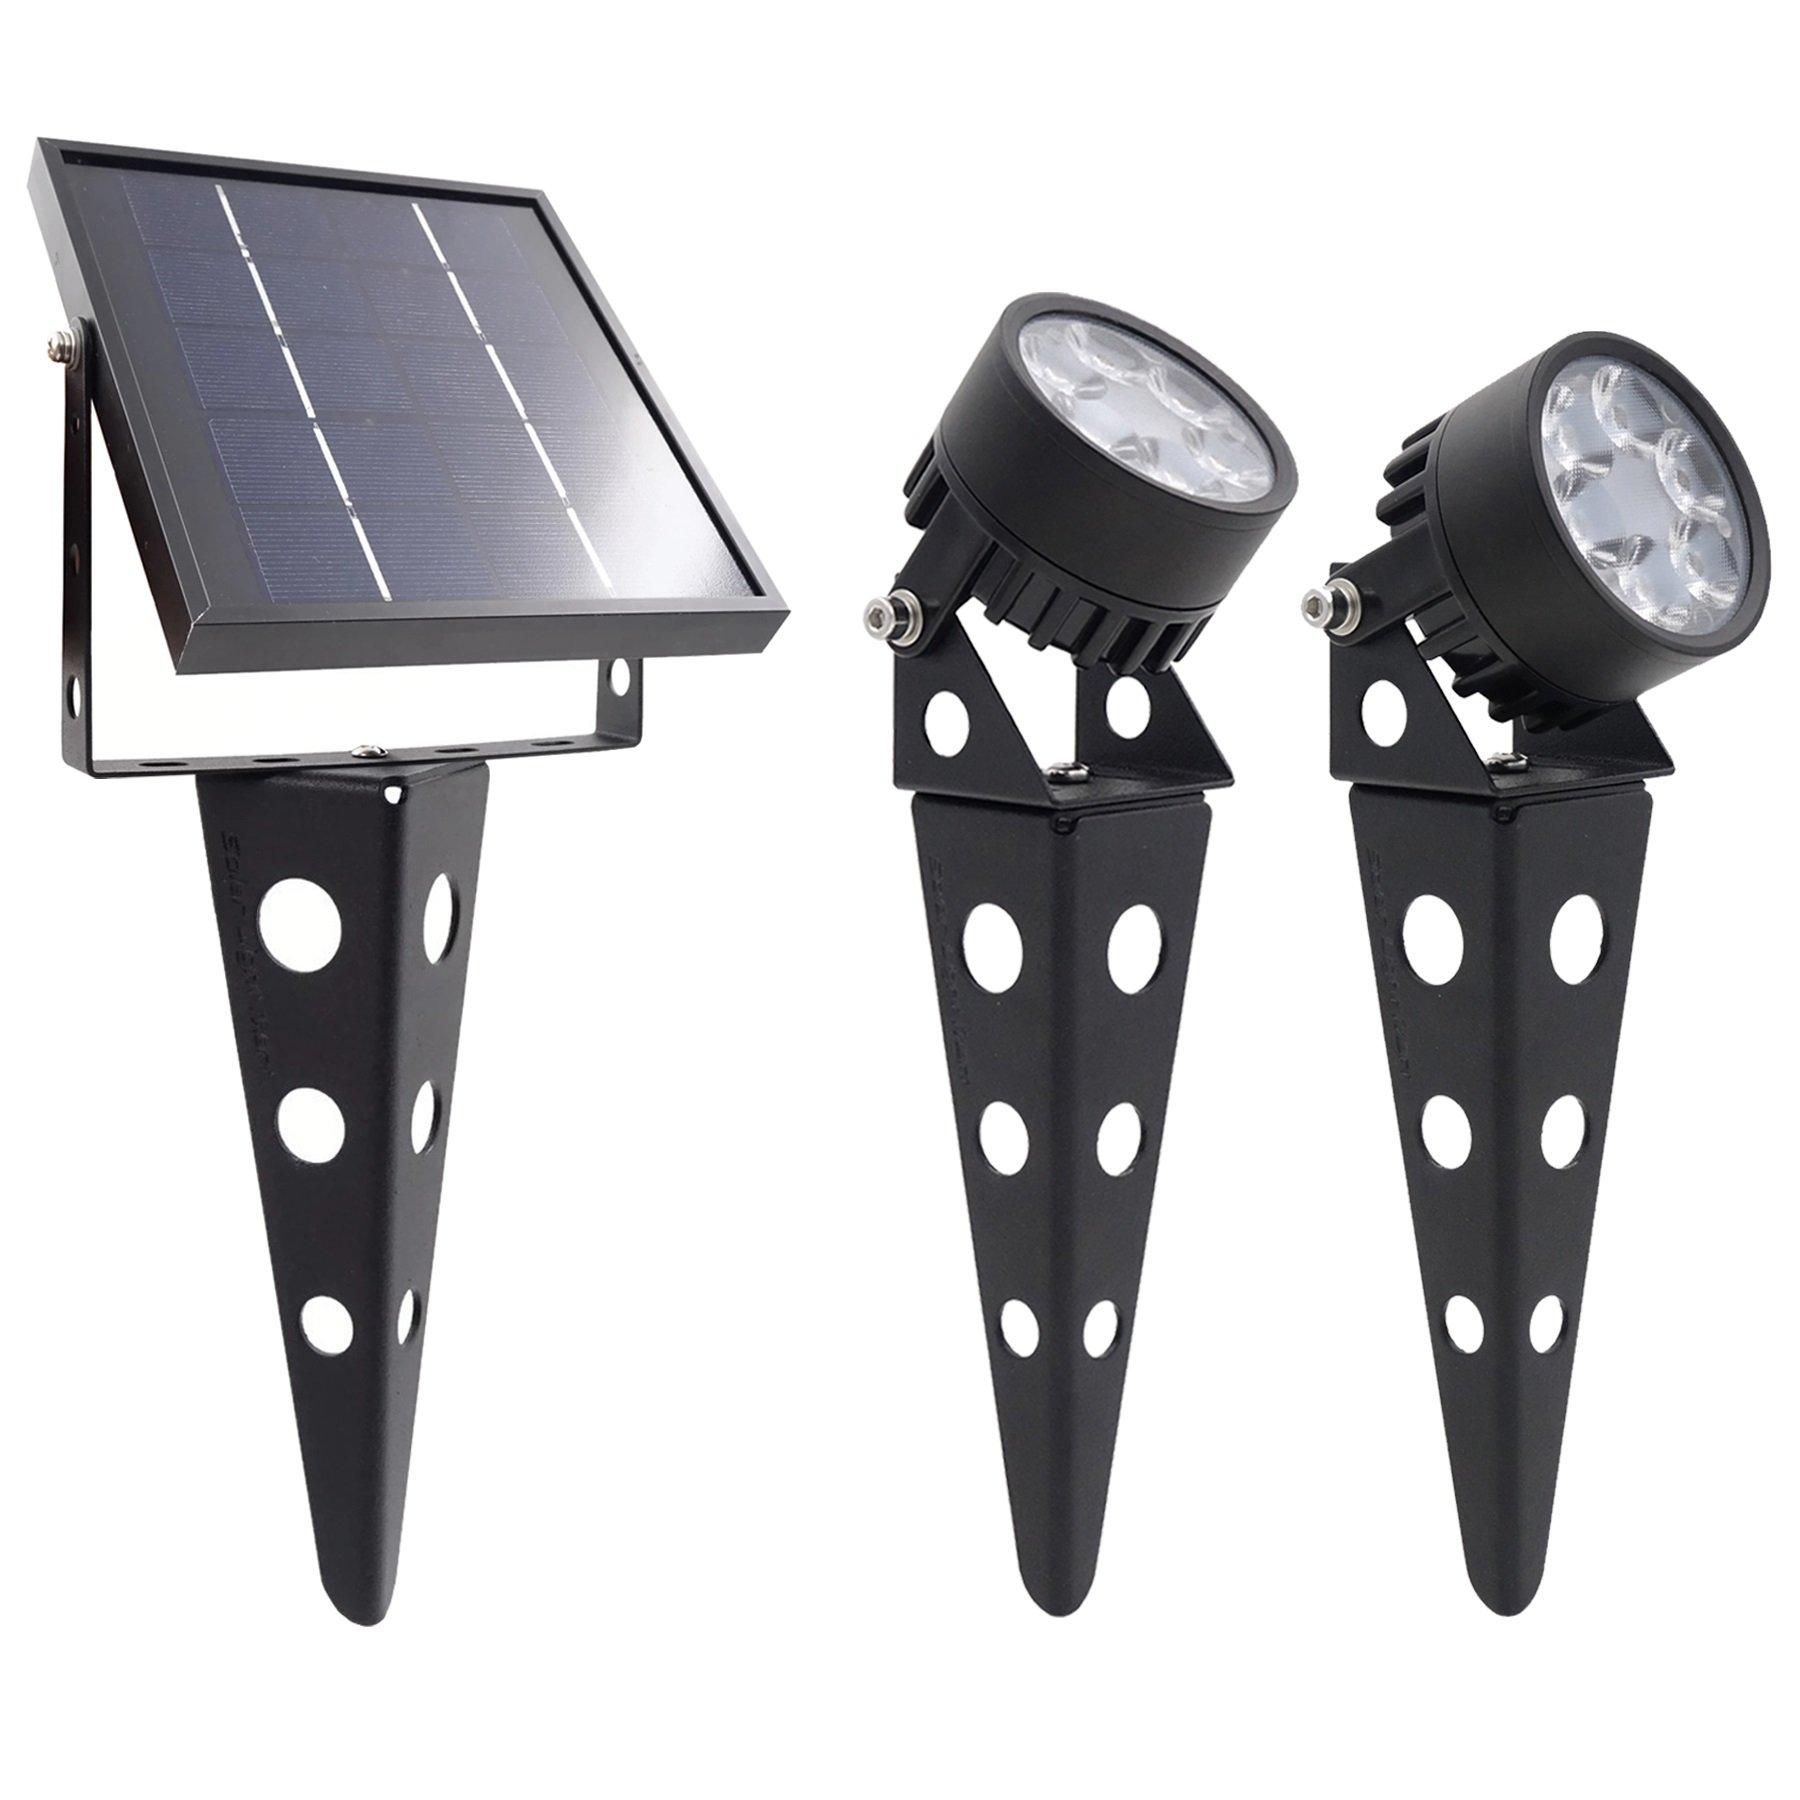 Legacy Mini 50X Twin Solar-Powered LED Spotlight (Warm White LED) for Outdoor Garden Yard Landscape Downlight, Black Finish